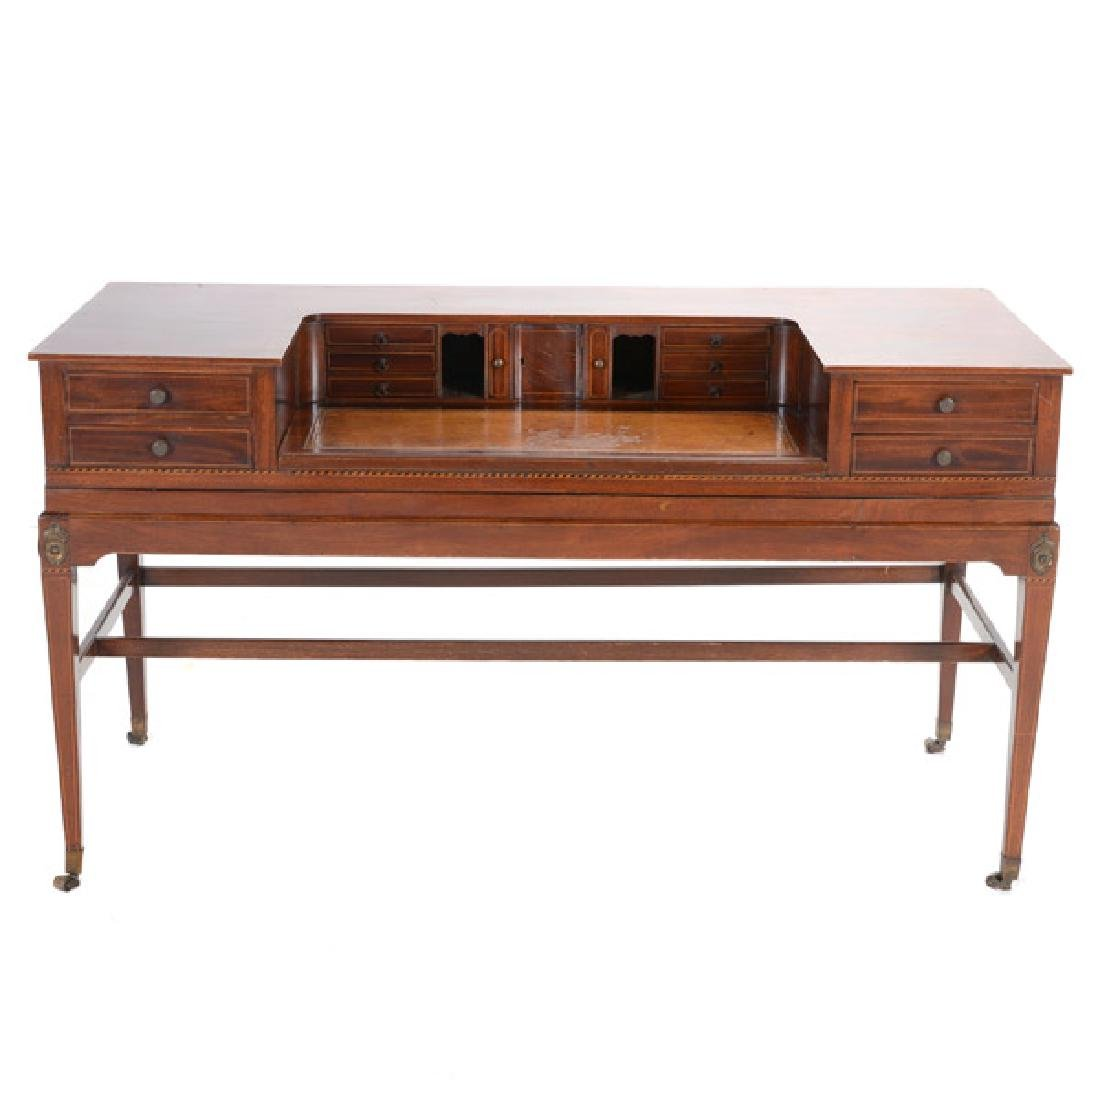 George III Style Inlaid Mahogany Desk